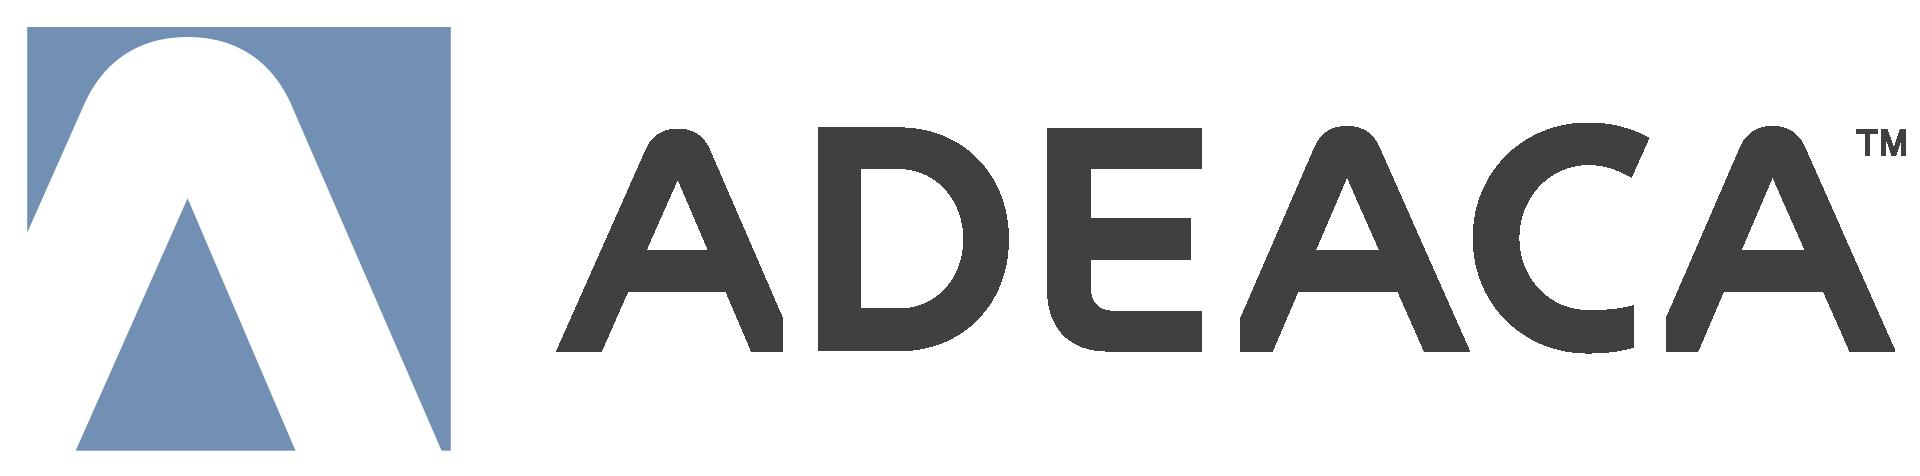 Value Proposition of PBA Reveals in Adeaca Video